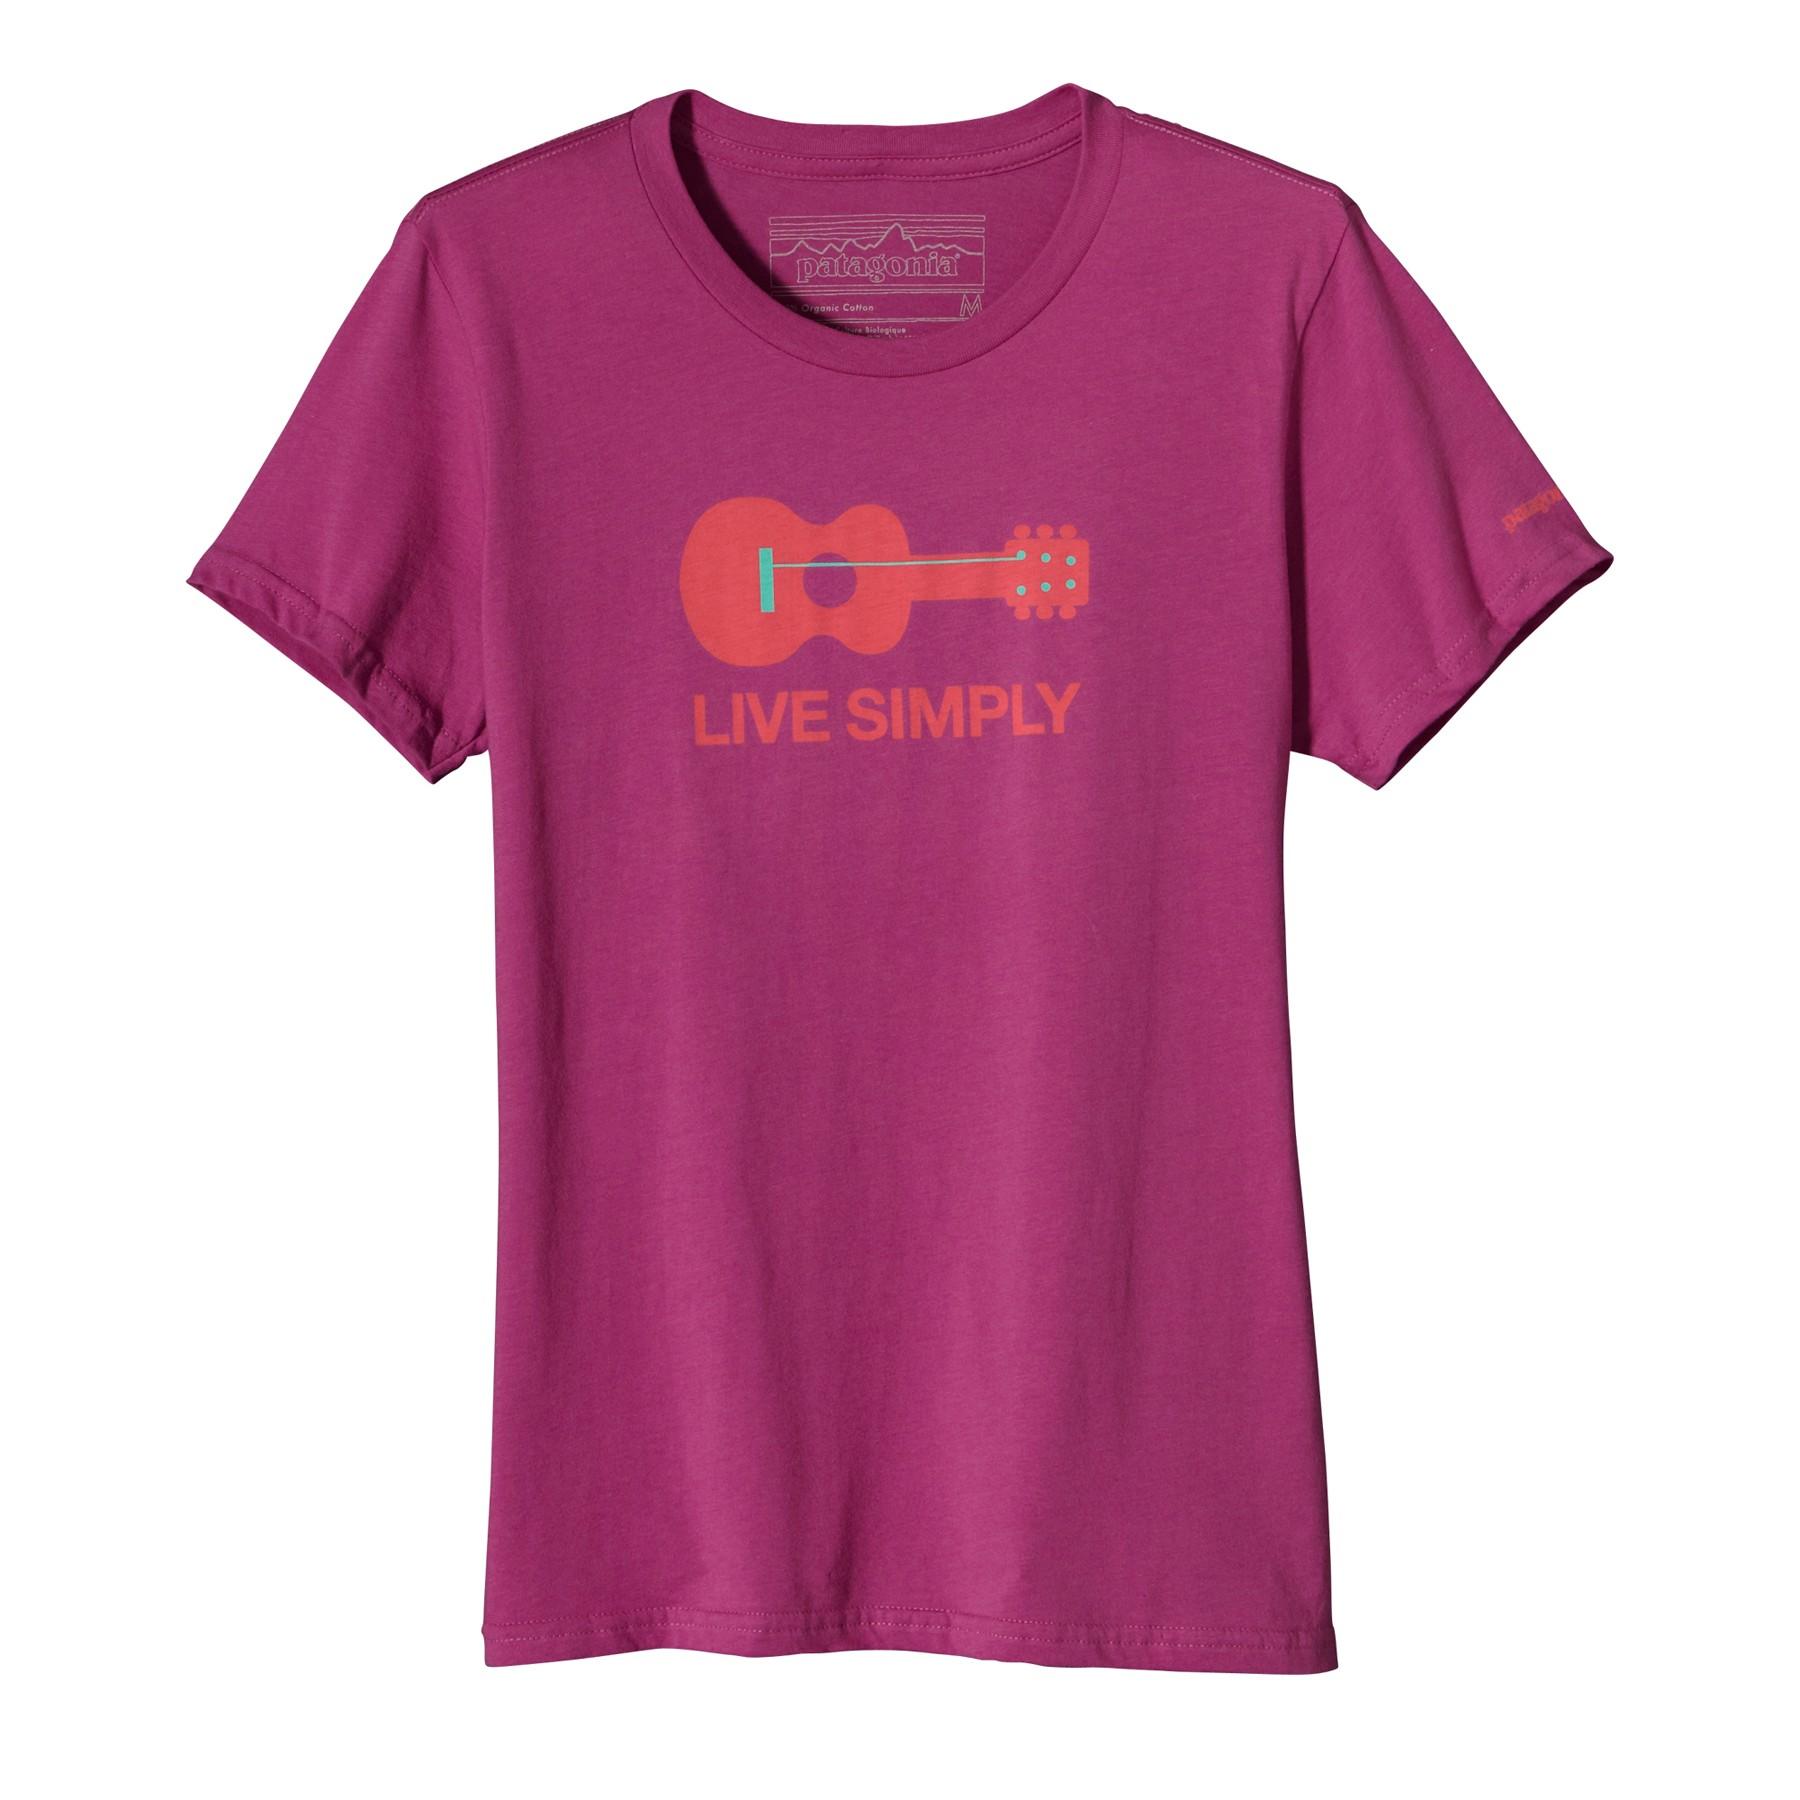 Patagonia Women's Live Simply™ Guitar T-Shirt - Rubellite Pinkl